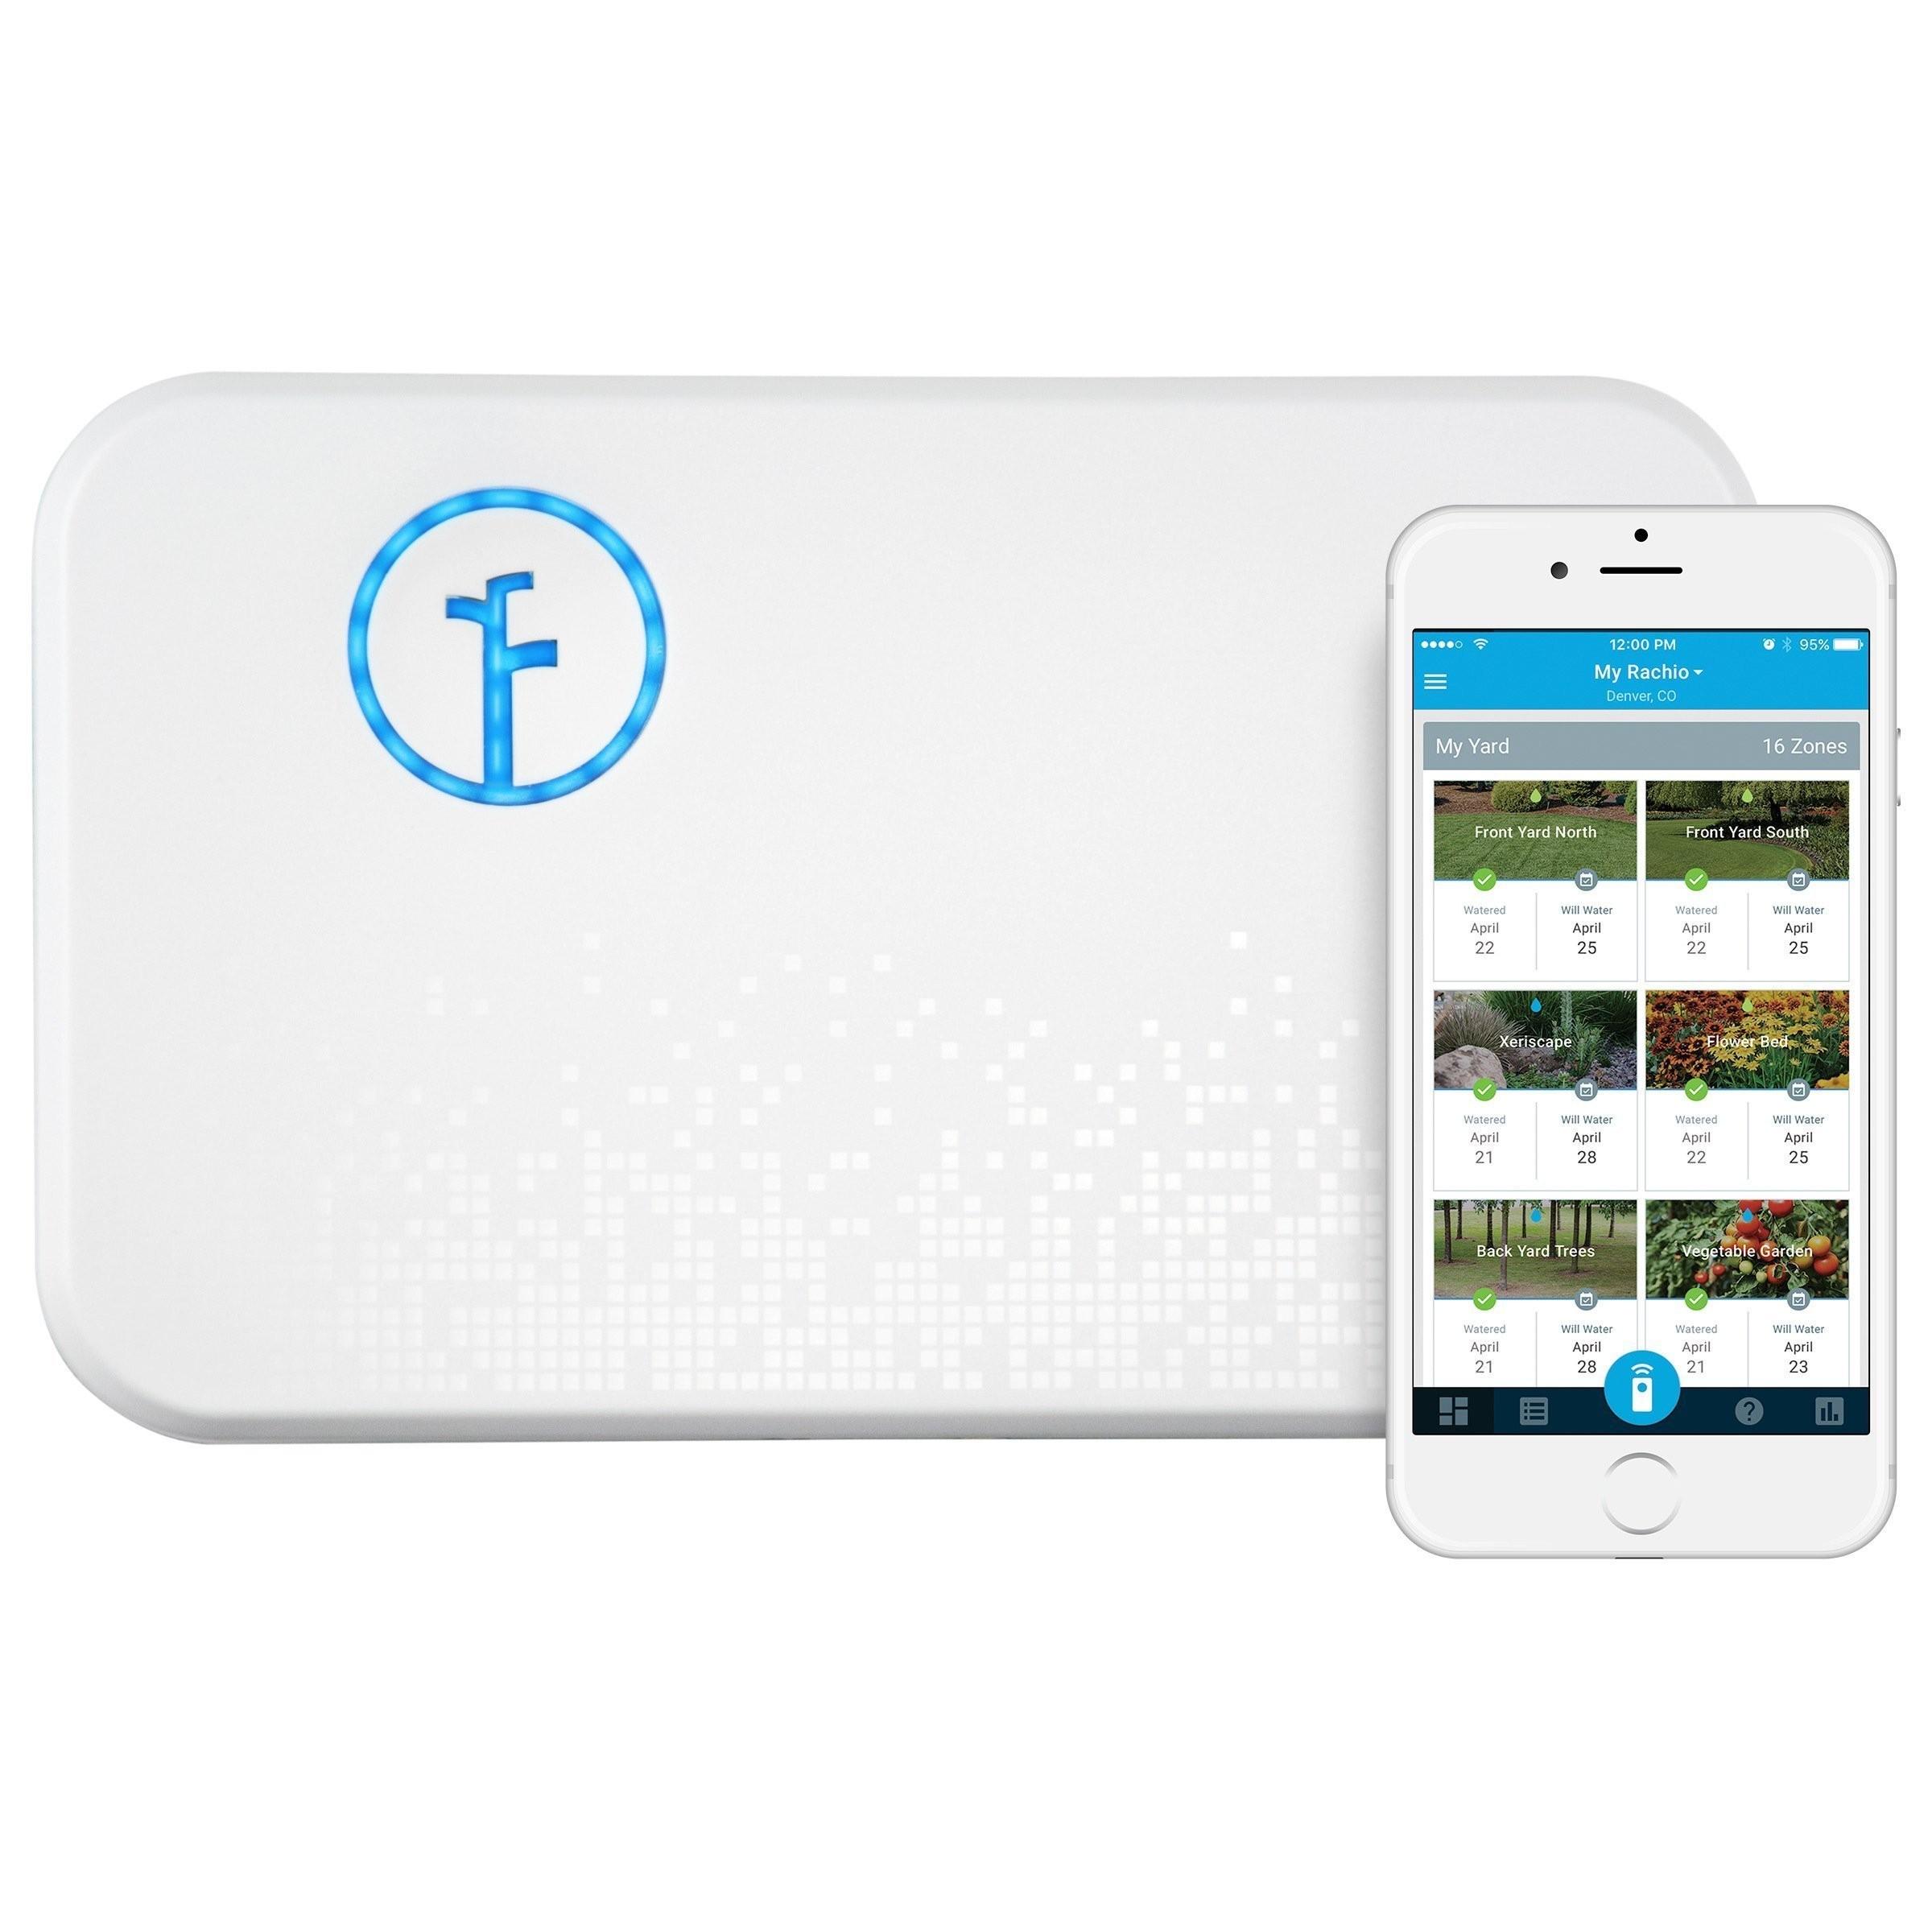 Rachio Smart Sprinkler Controller WiFi 8 Zone 2nd Generation Works with Amazon Alexa